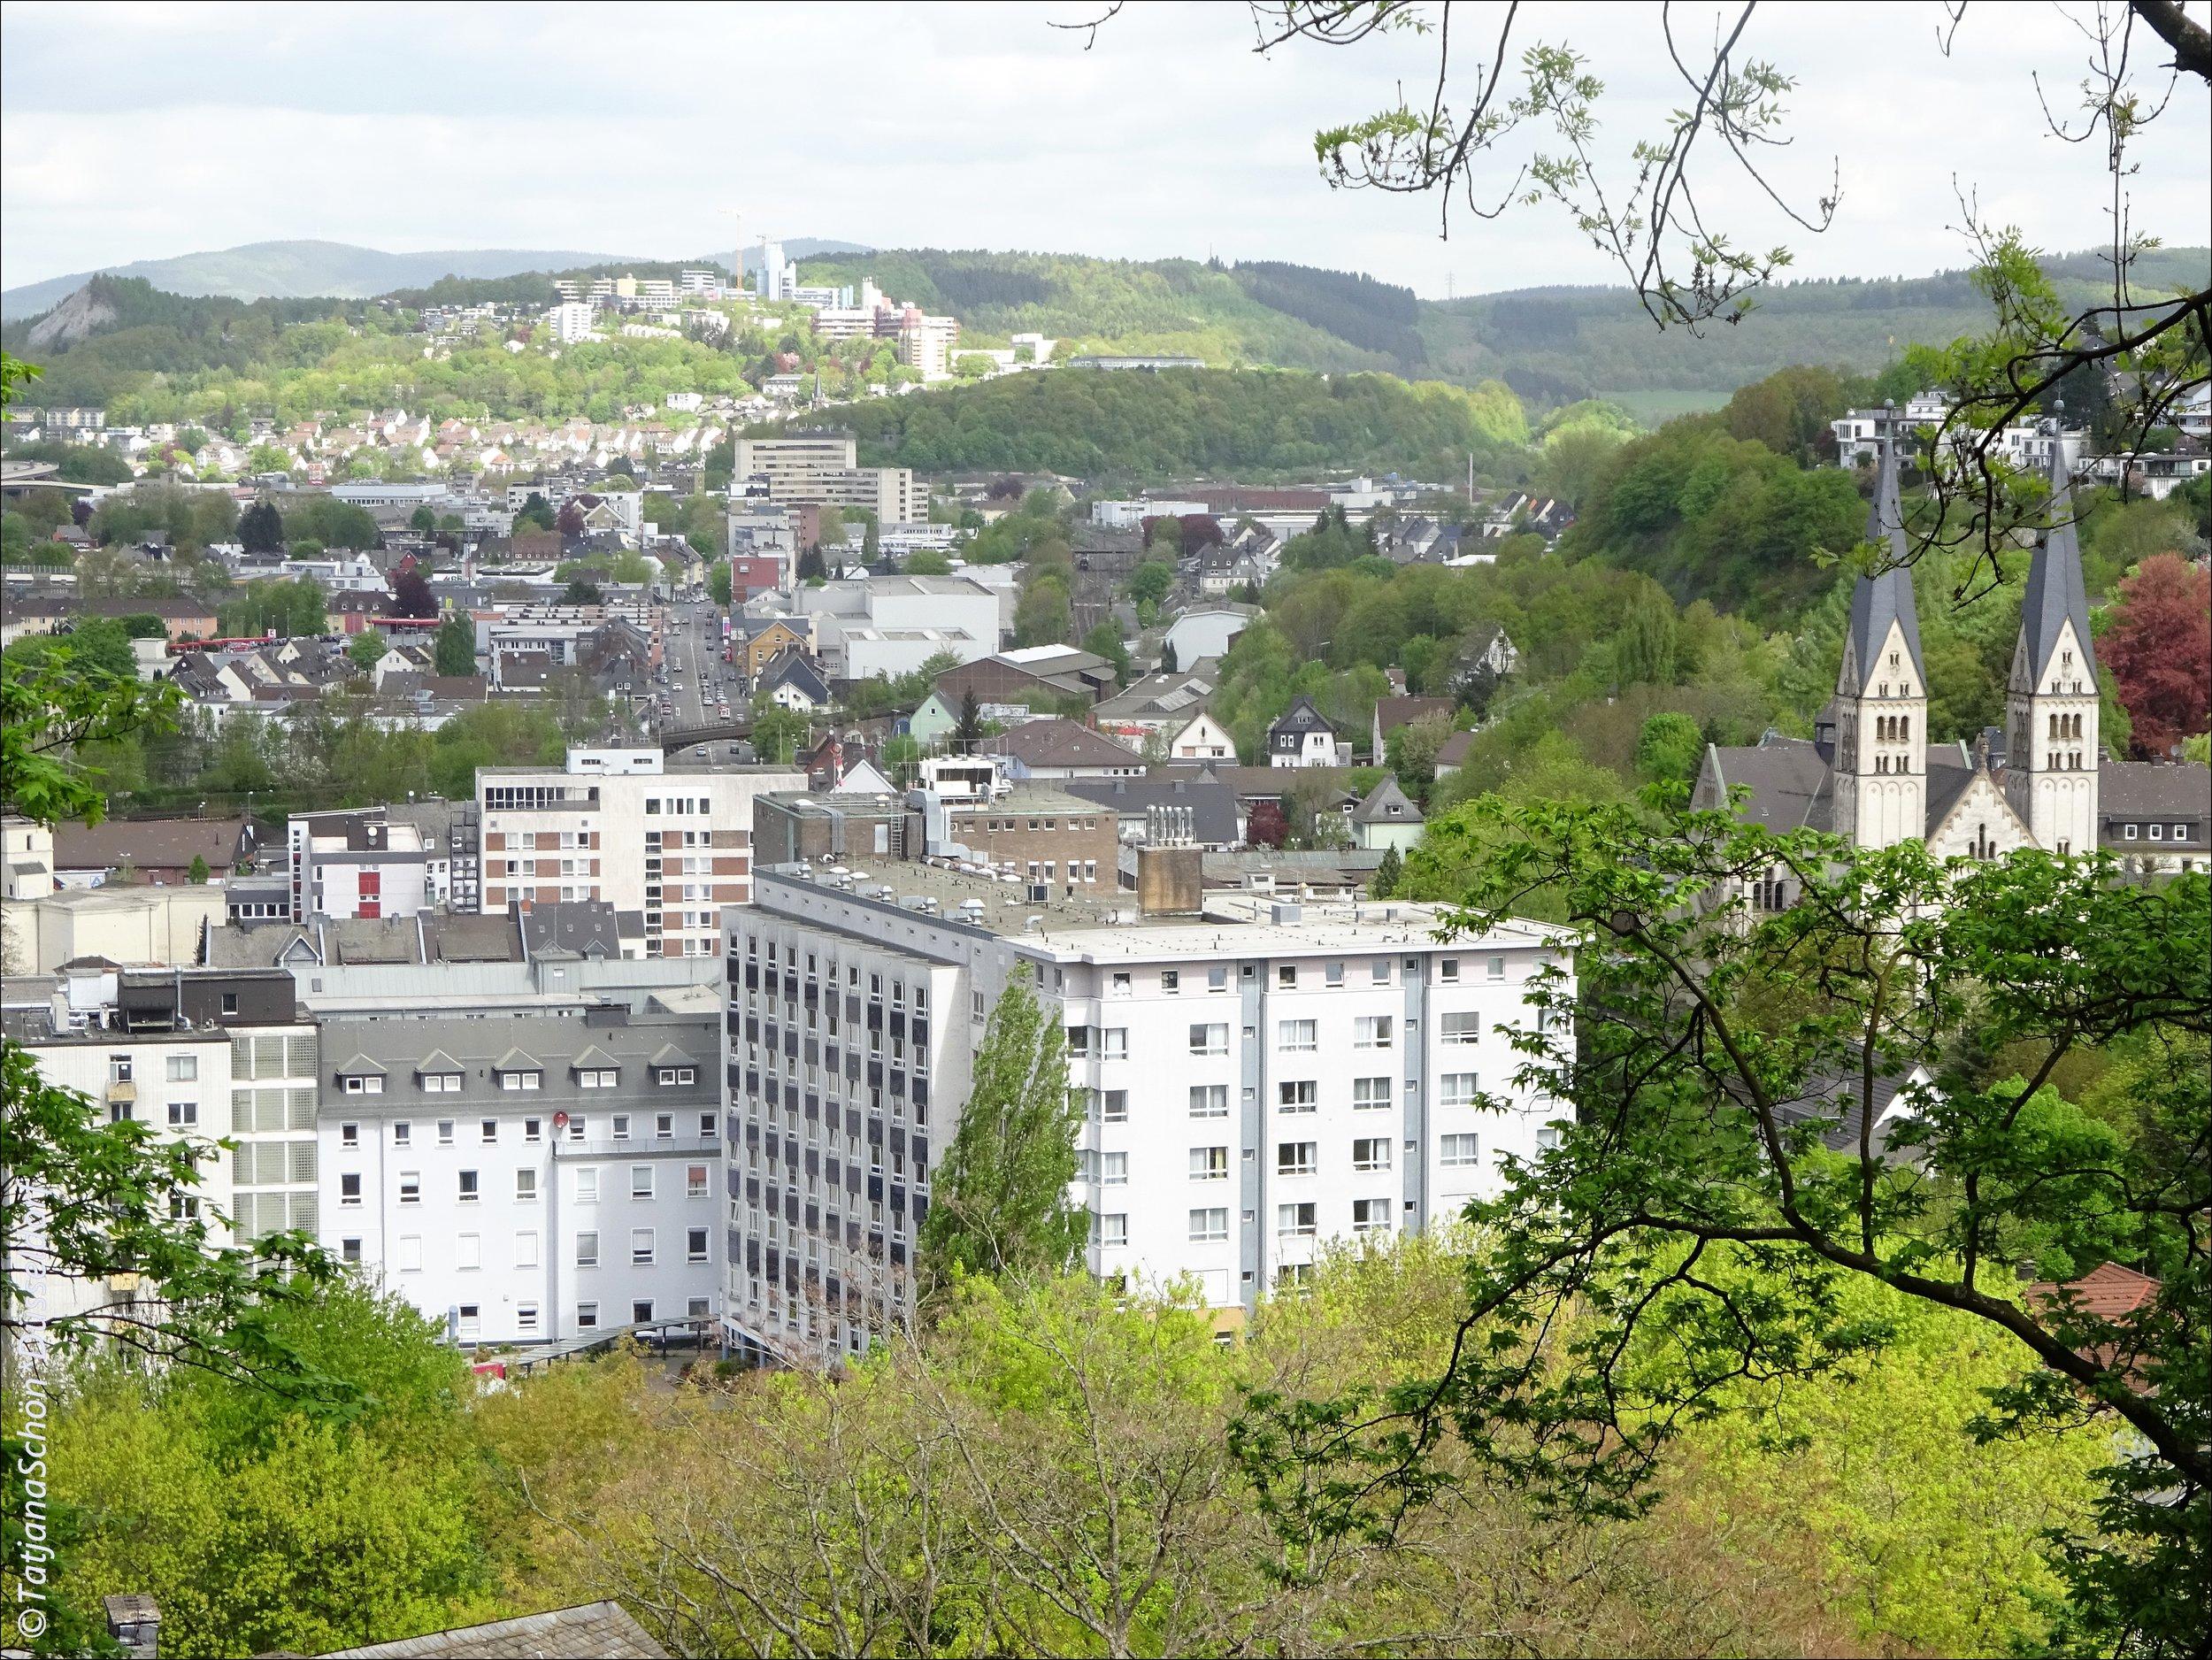 Siegen-natur59-2018.JPG